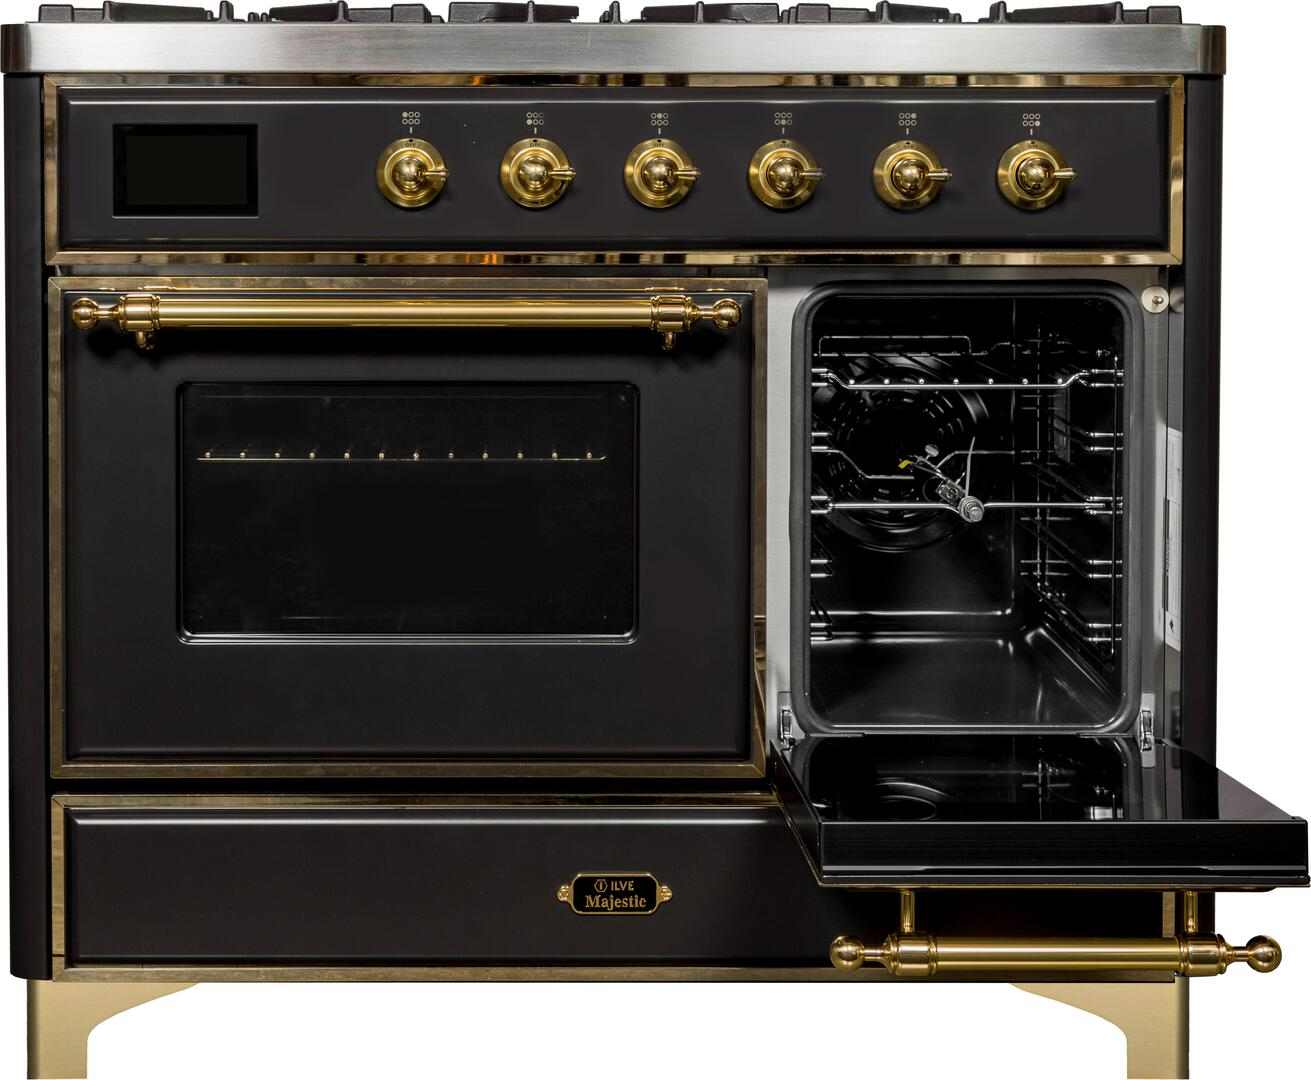 Ilve Majestic II UMD10FDNS3MGG Freestanding Dual Fuel Range Graphite, UMD10FDNS3MGG Side Oven Door Opened